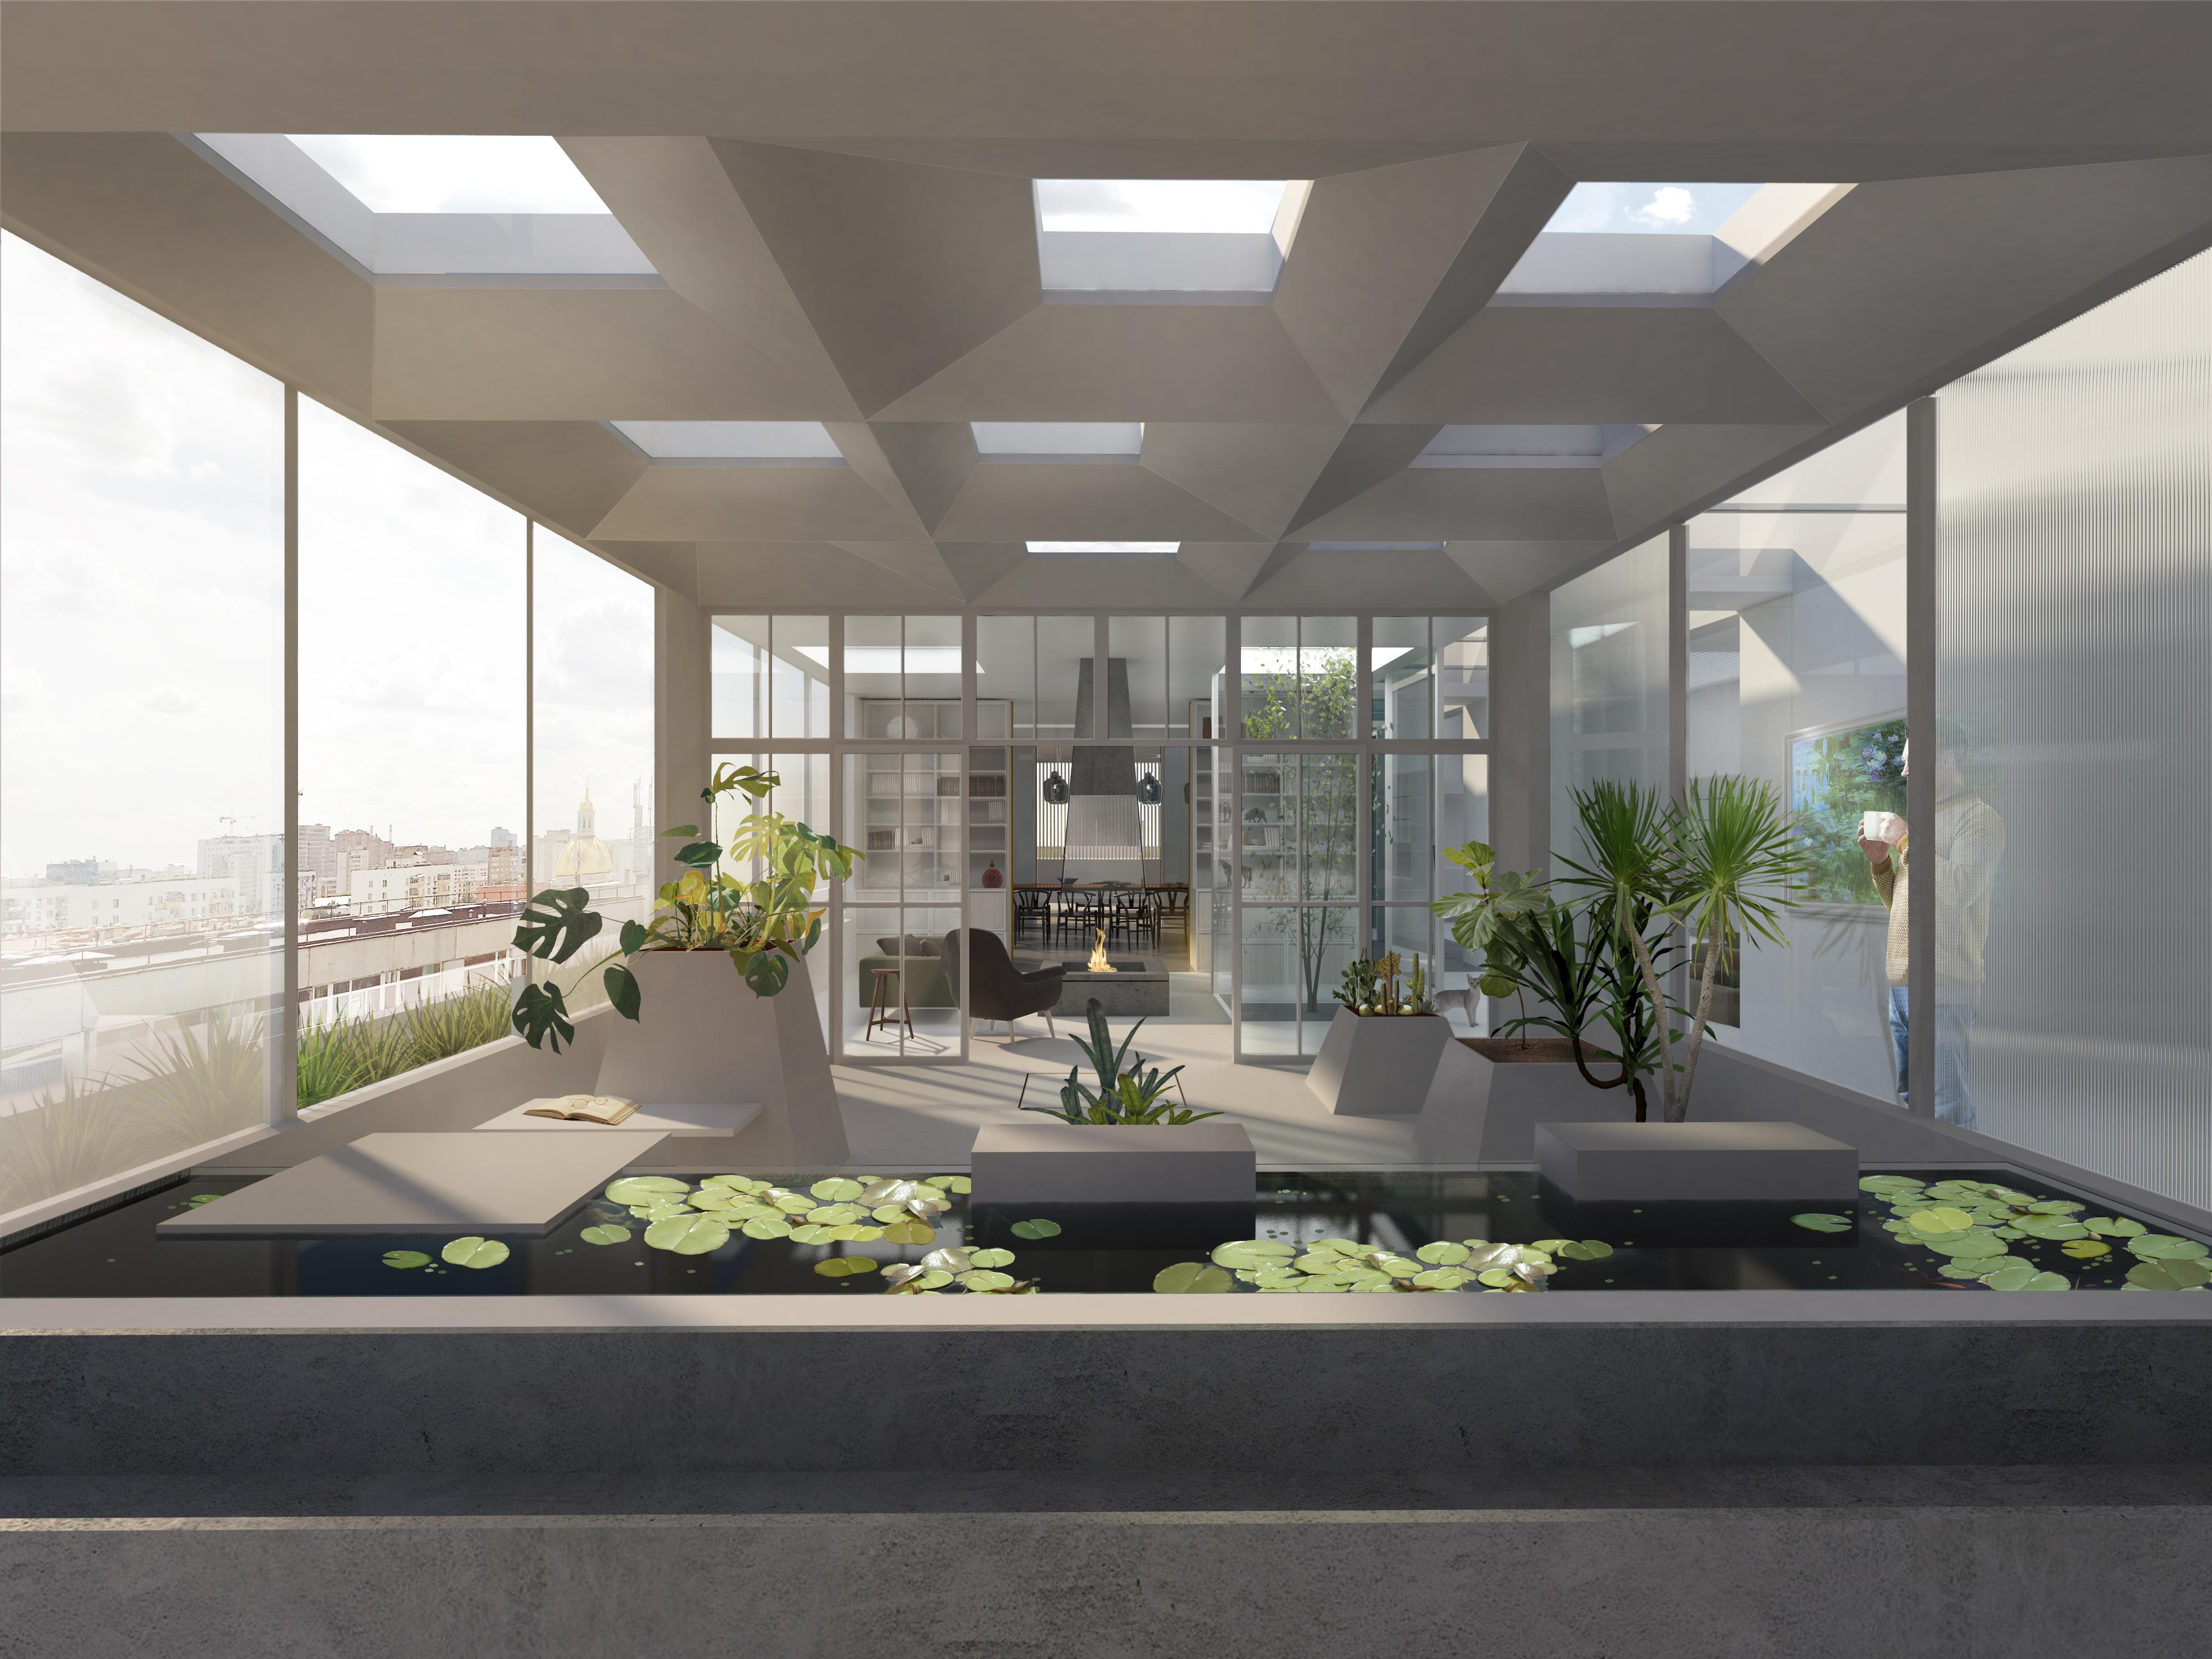 1 Hour 3D Tutorial with Award Winning Architects - Threefold Image